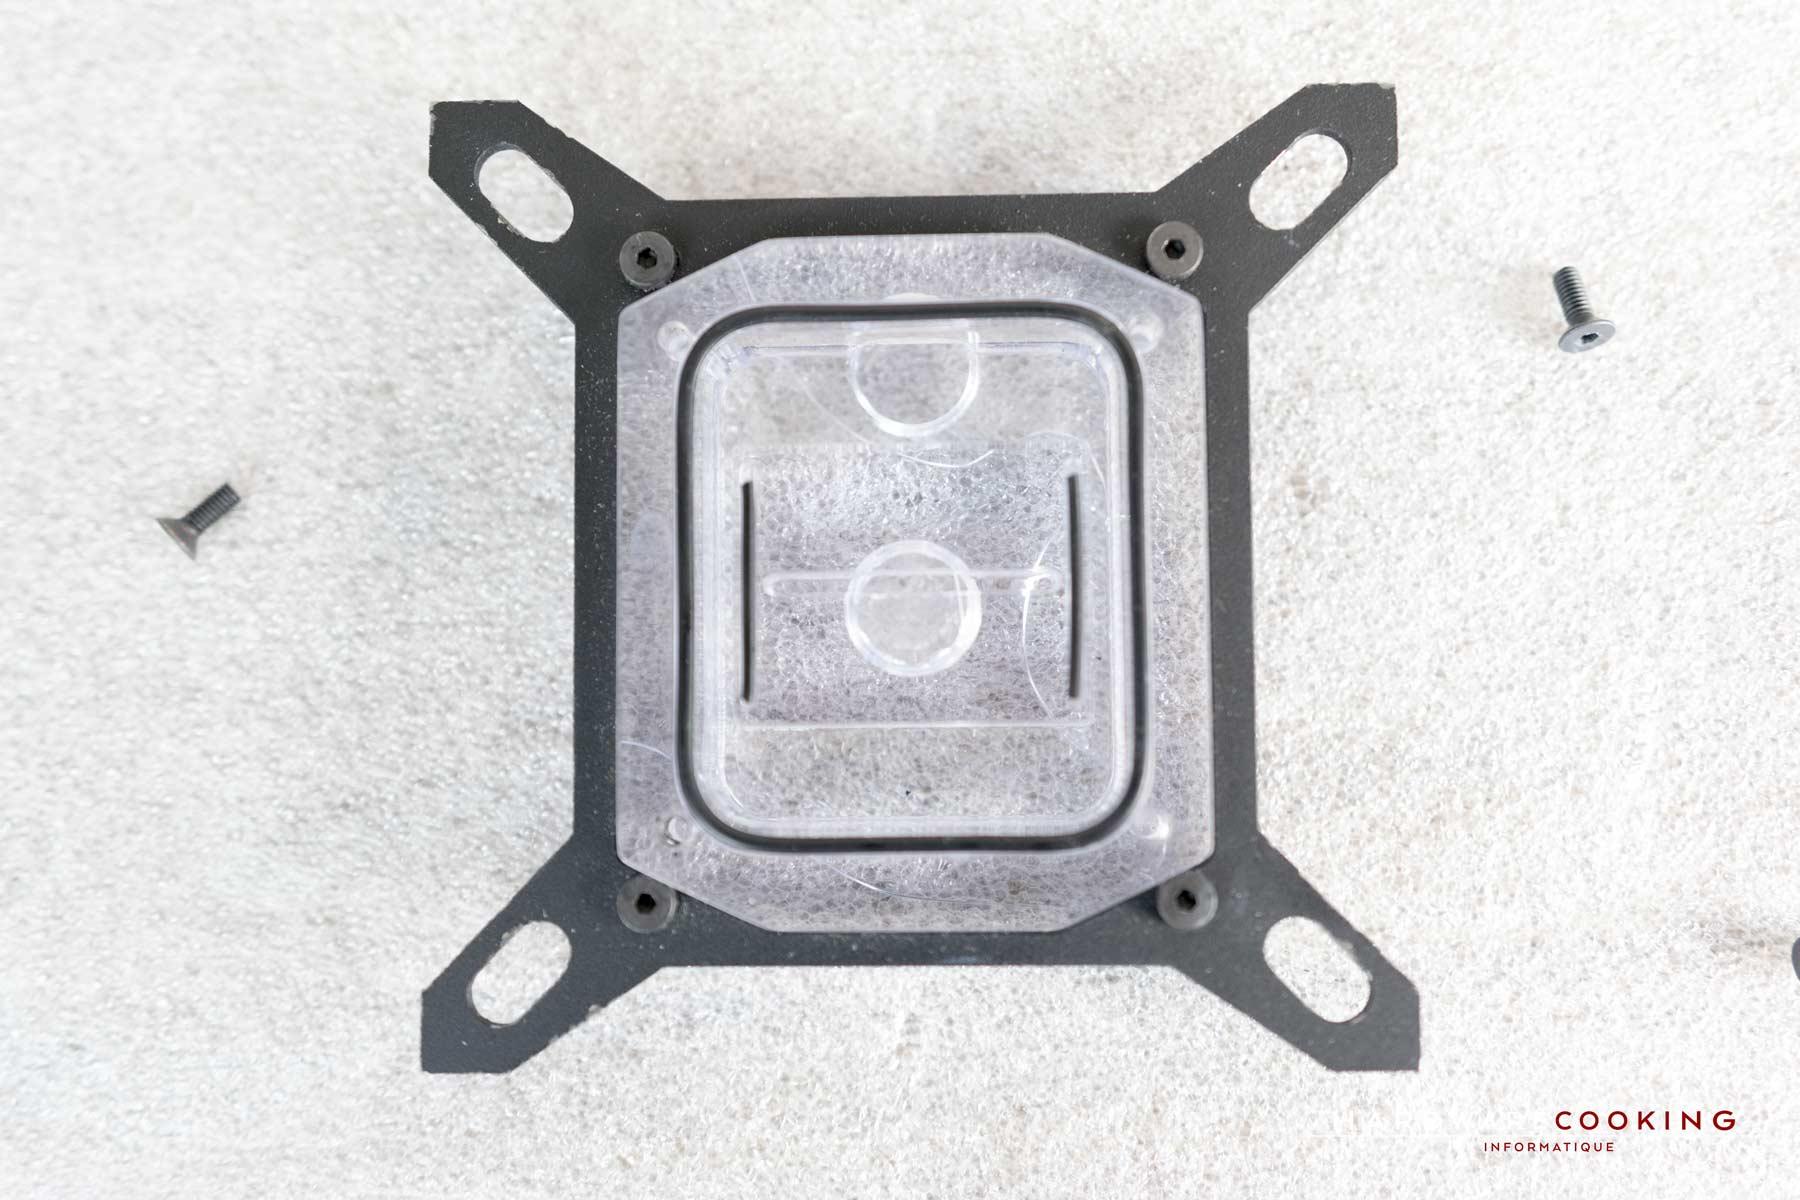 Test Waterblock Cpu Hcm Crystal Coldplate 78 Microcannaux